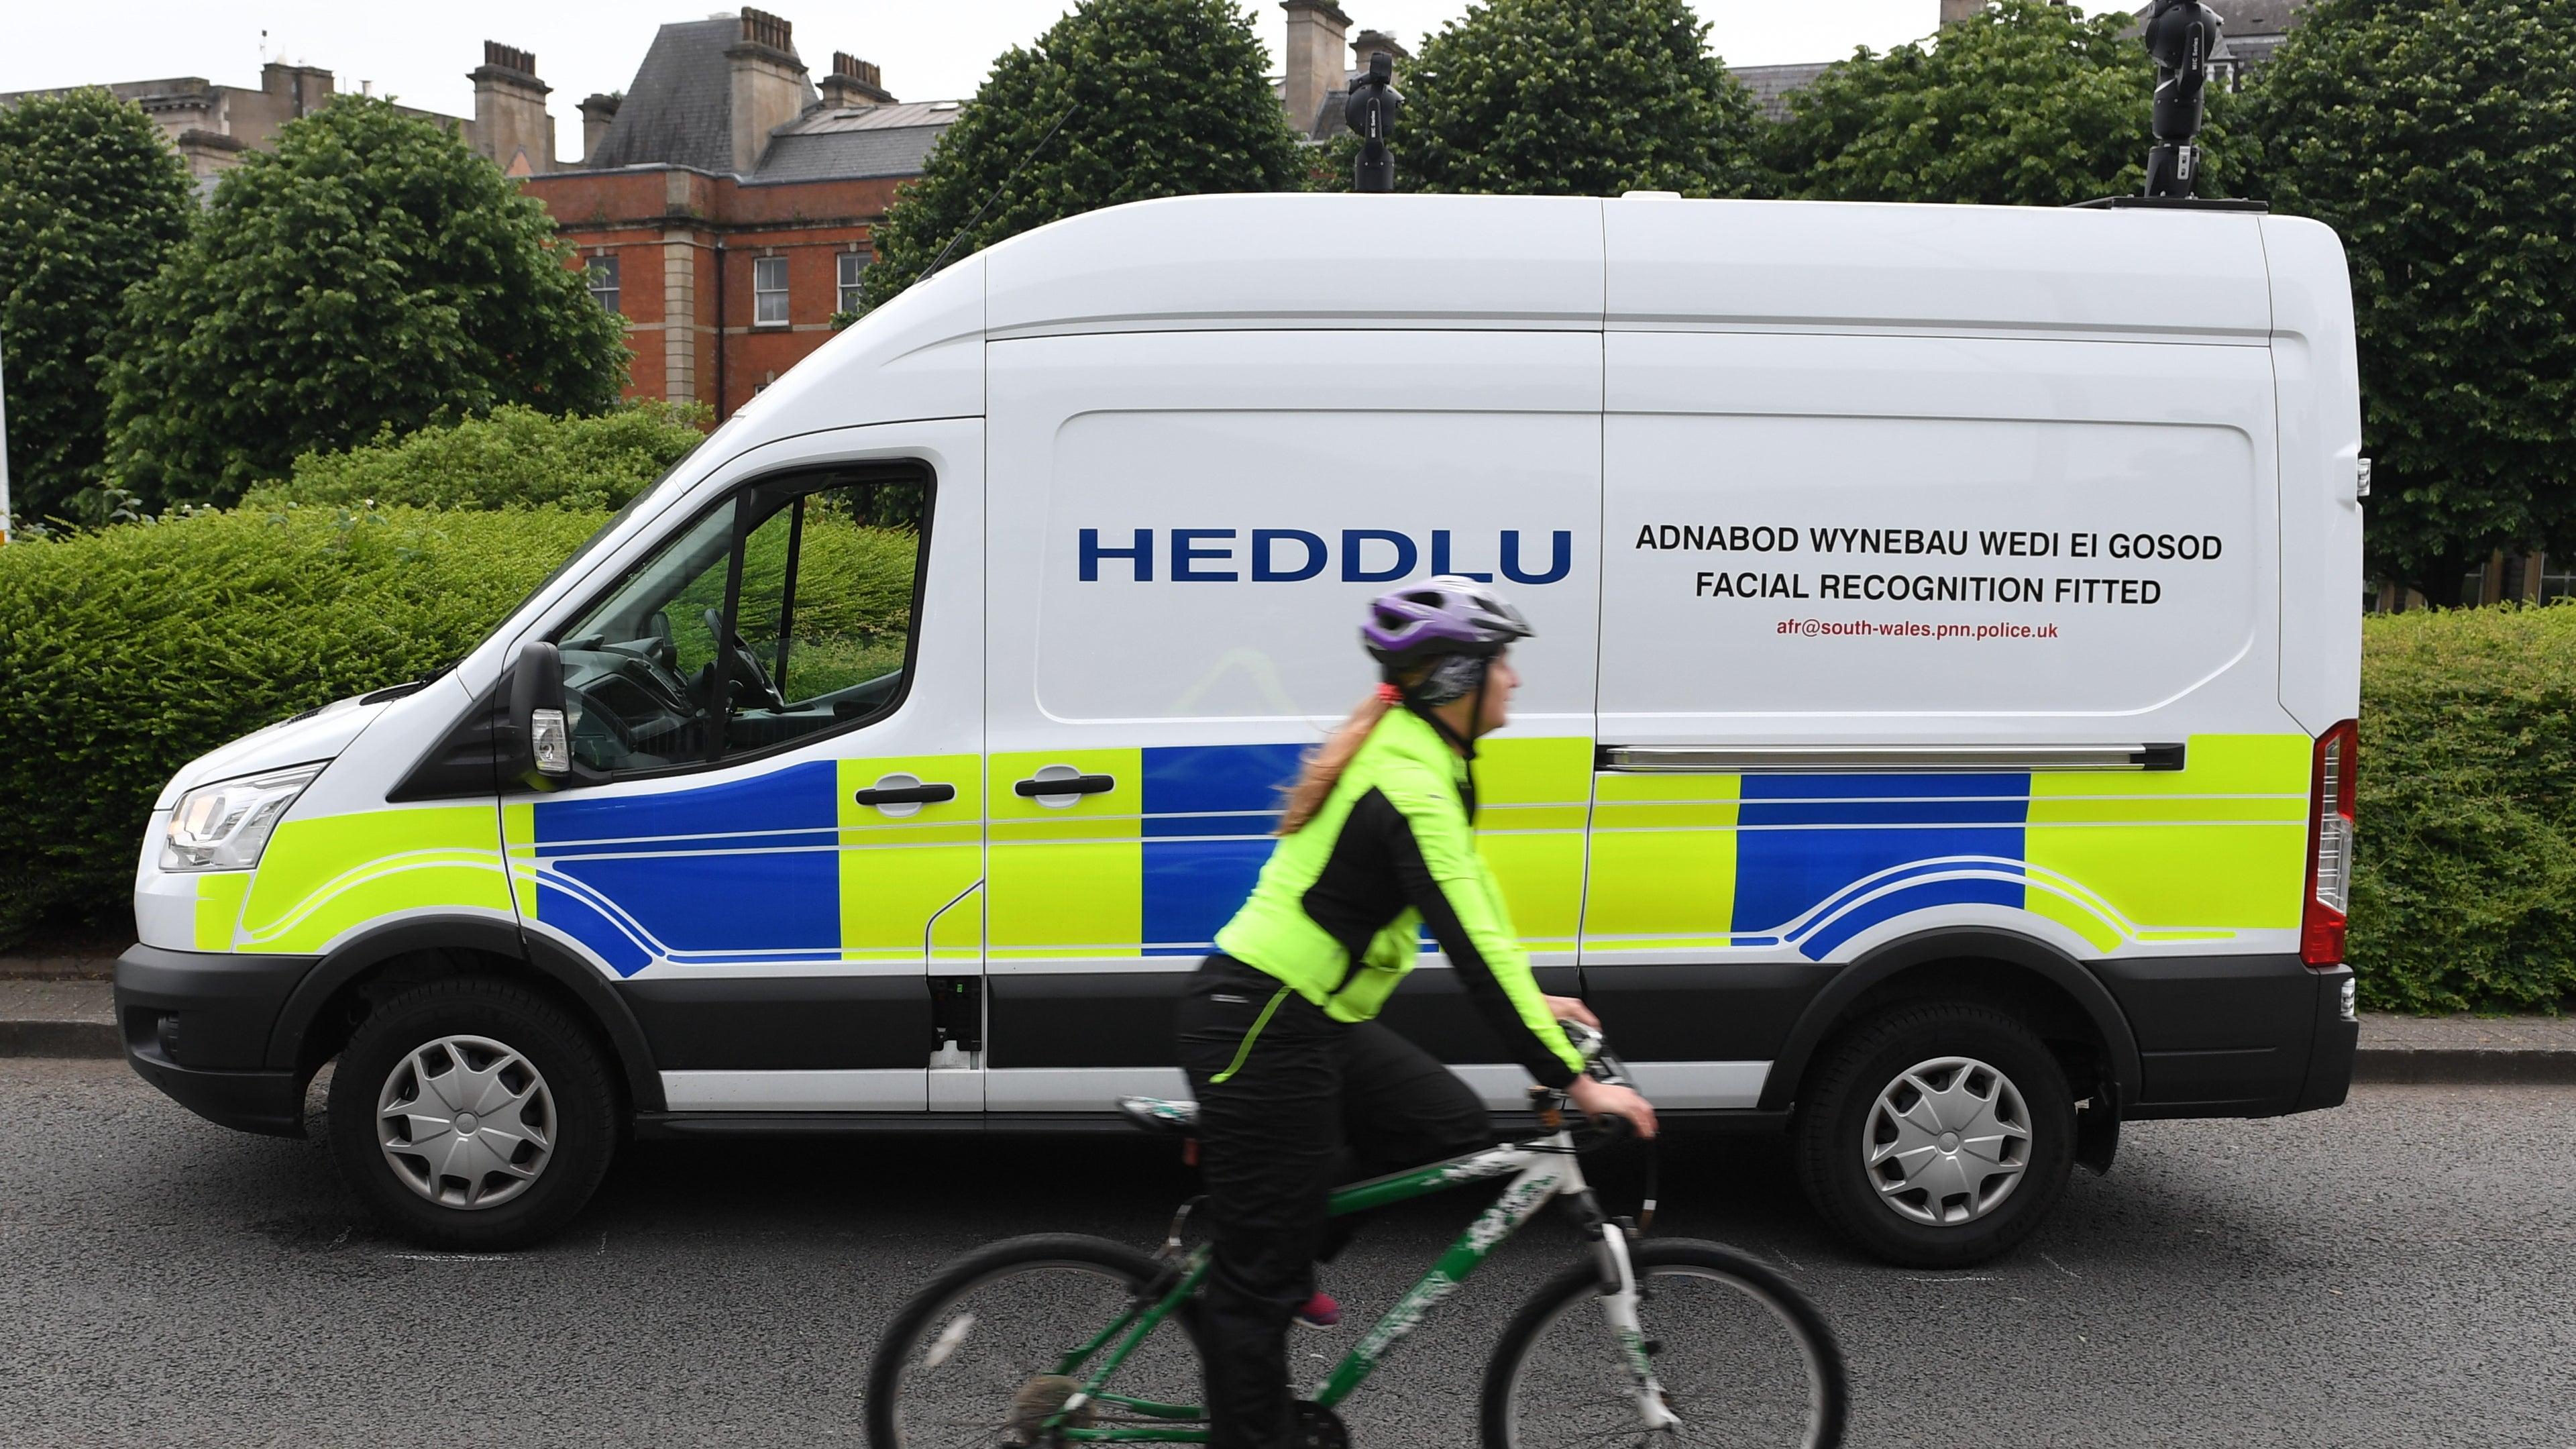 British Cops Make First Arrest Using Facial Recognition Surveillance Vans